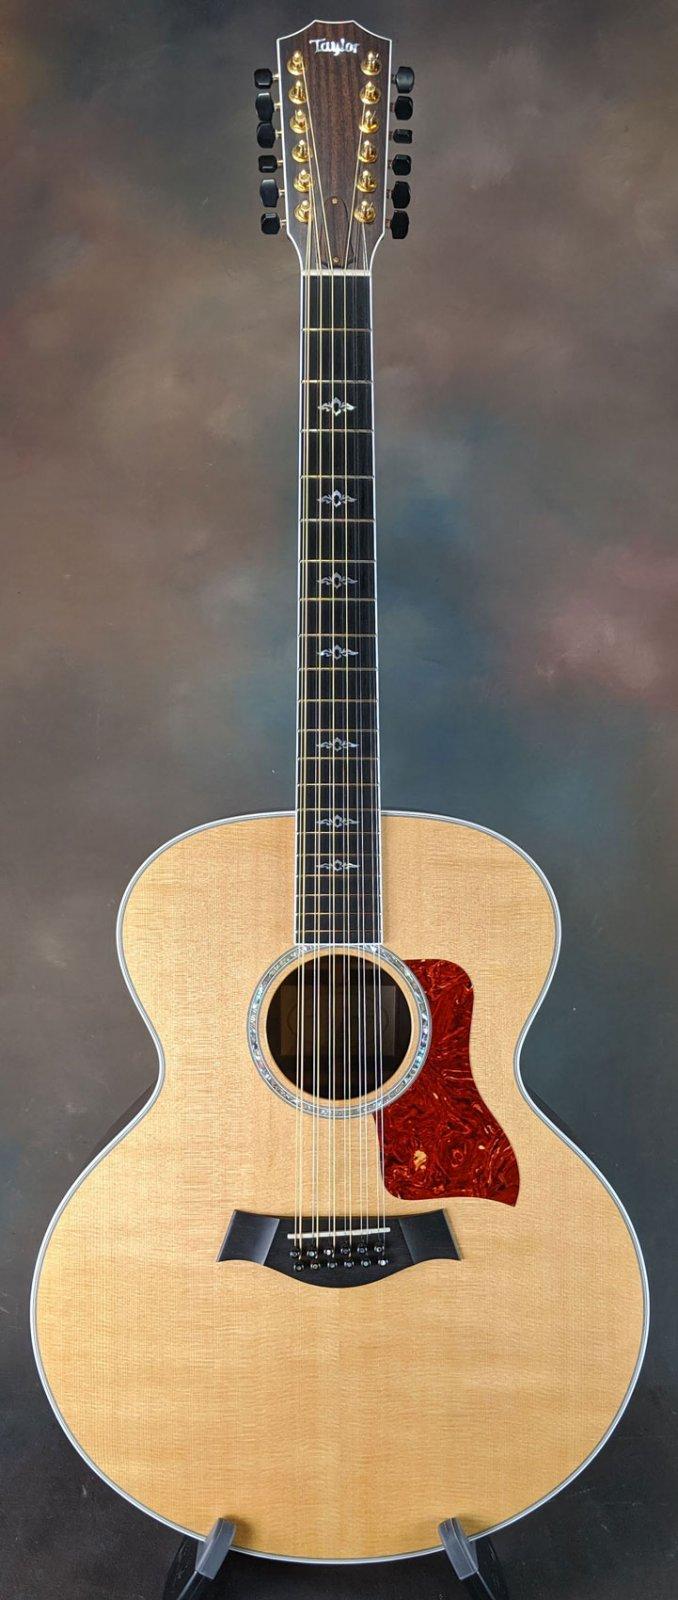 2006 Taylor 855 Jumbo 12-string